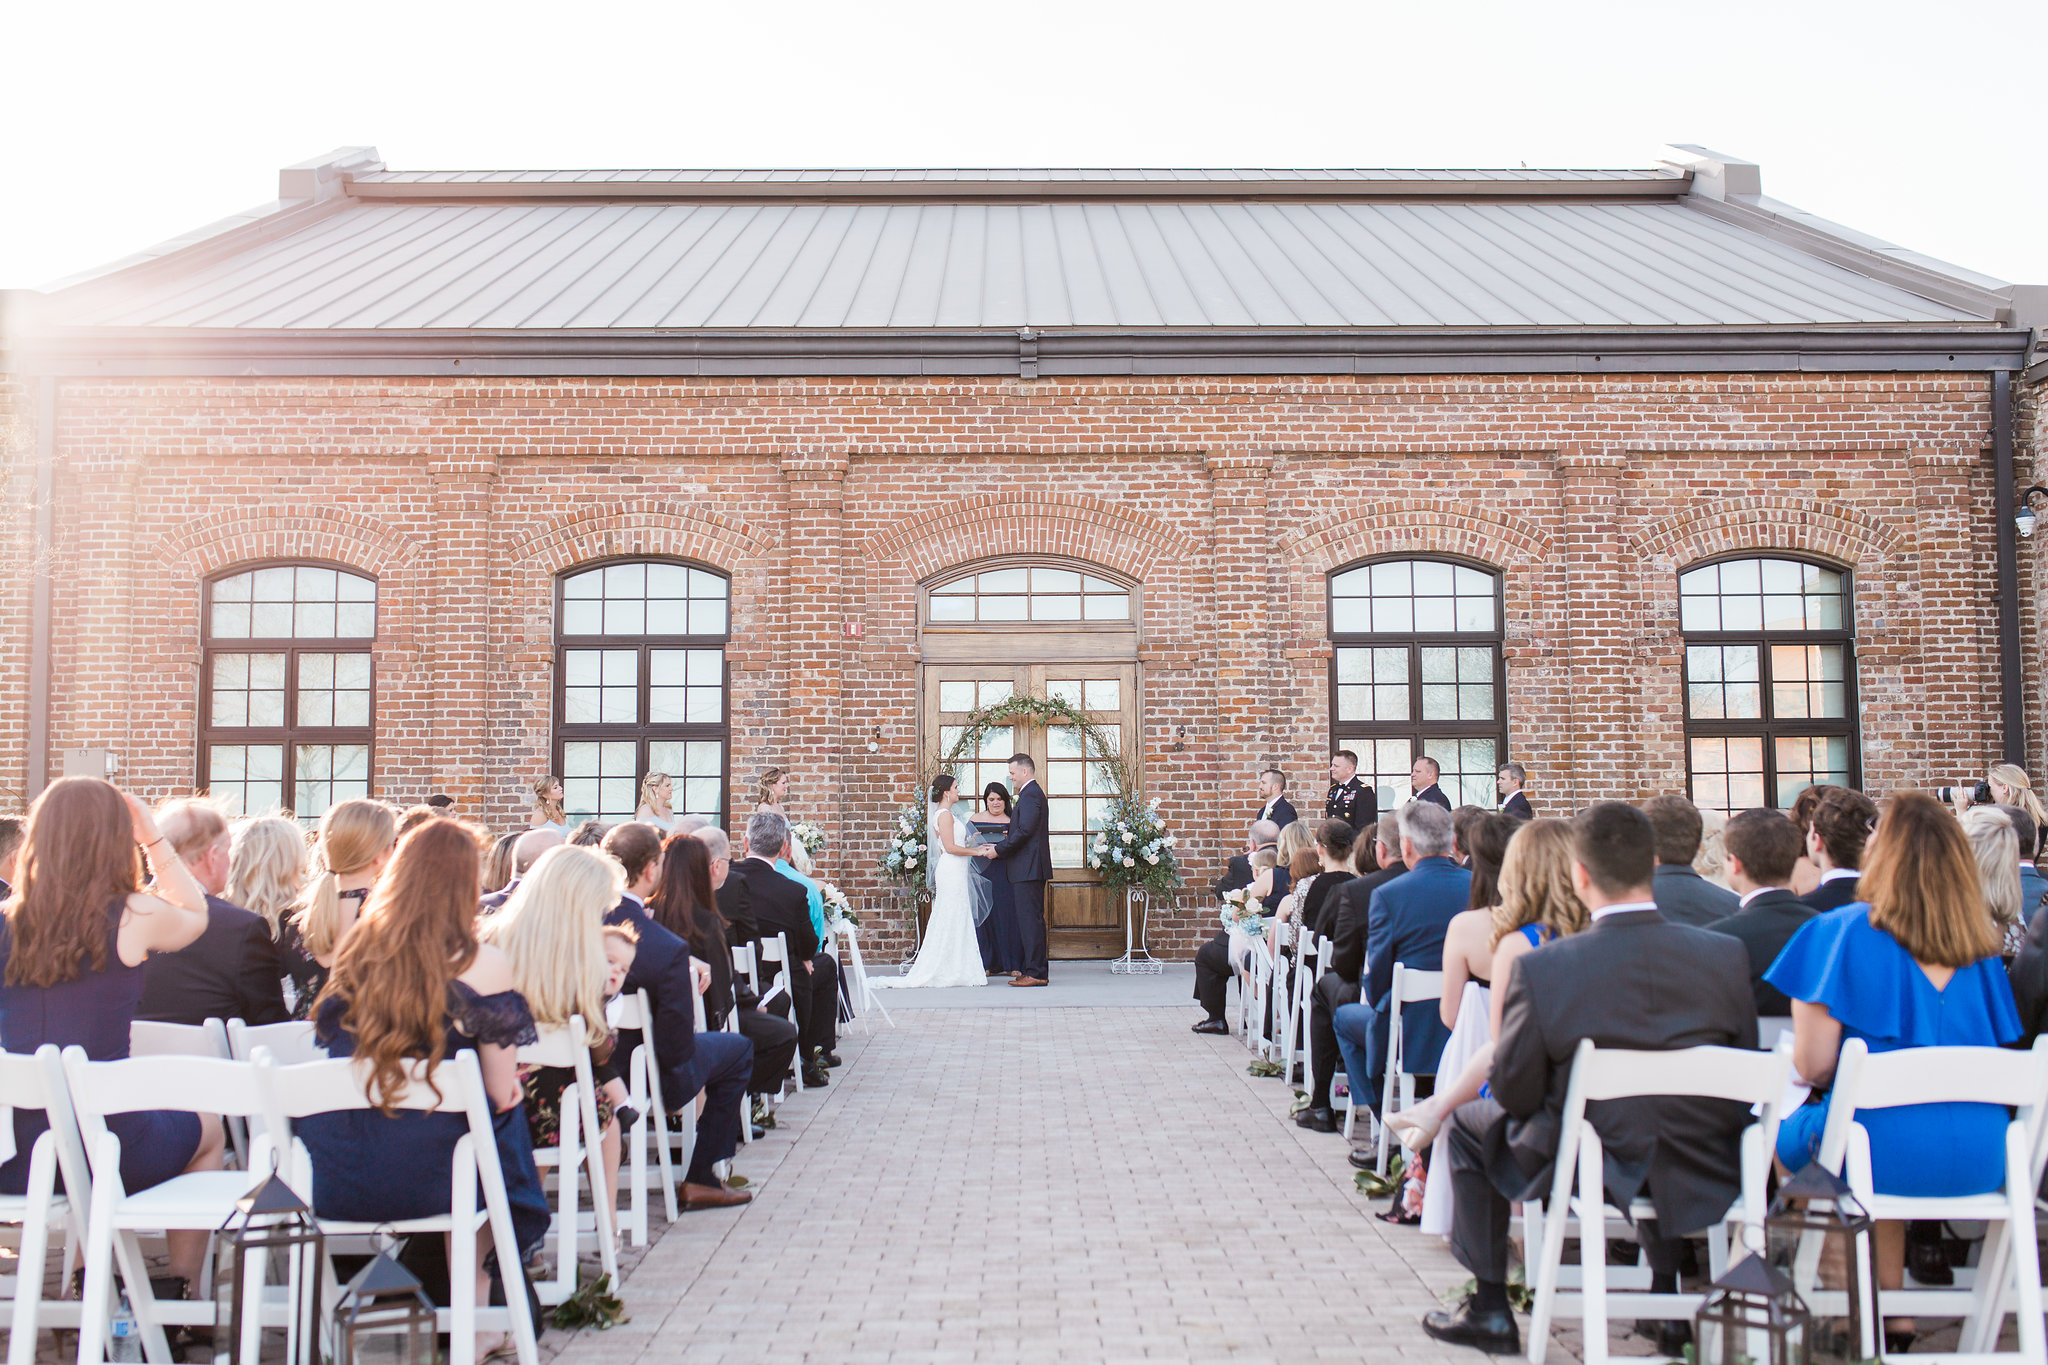 apt-b-photography-Savannah-wedding-photographer-savannah-engagement-photographer-historic-savannah-engagement-charles-h-morris-center-wedding-savannah-weddings-38.JPG